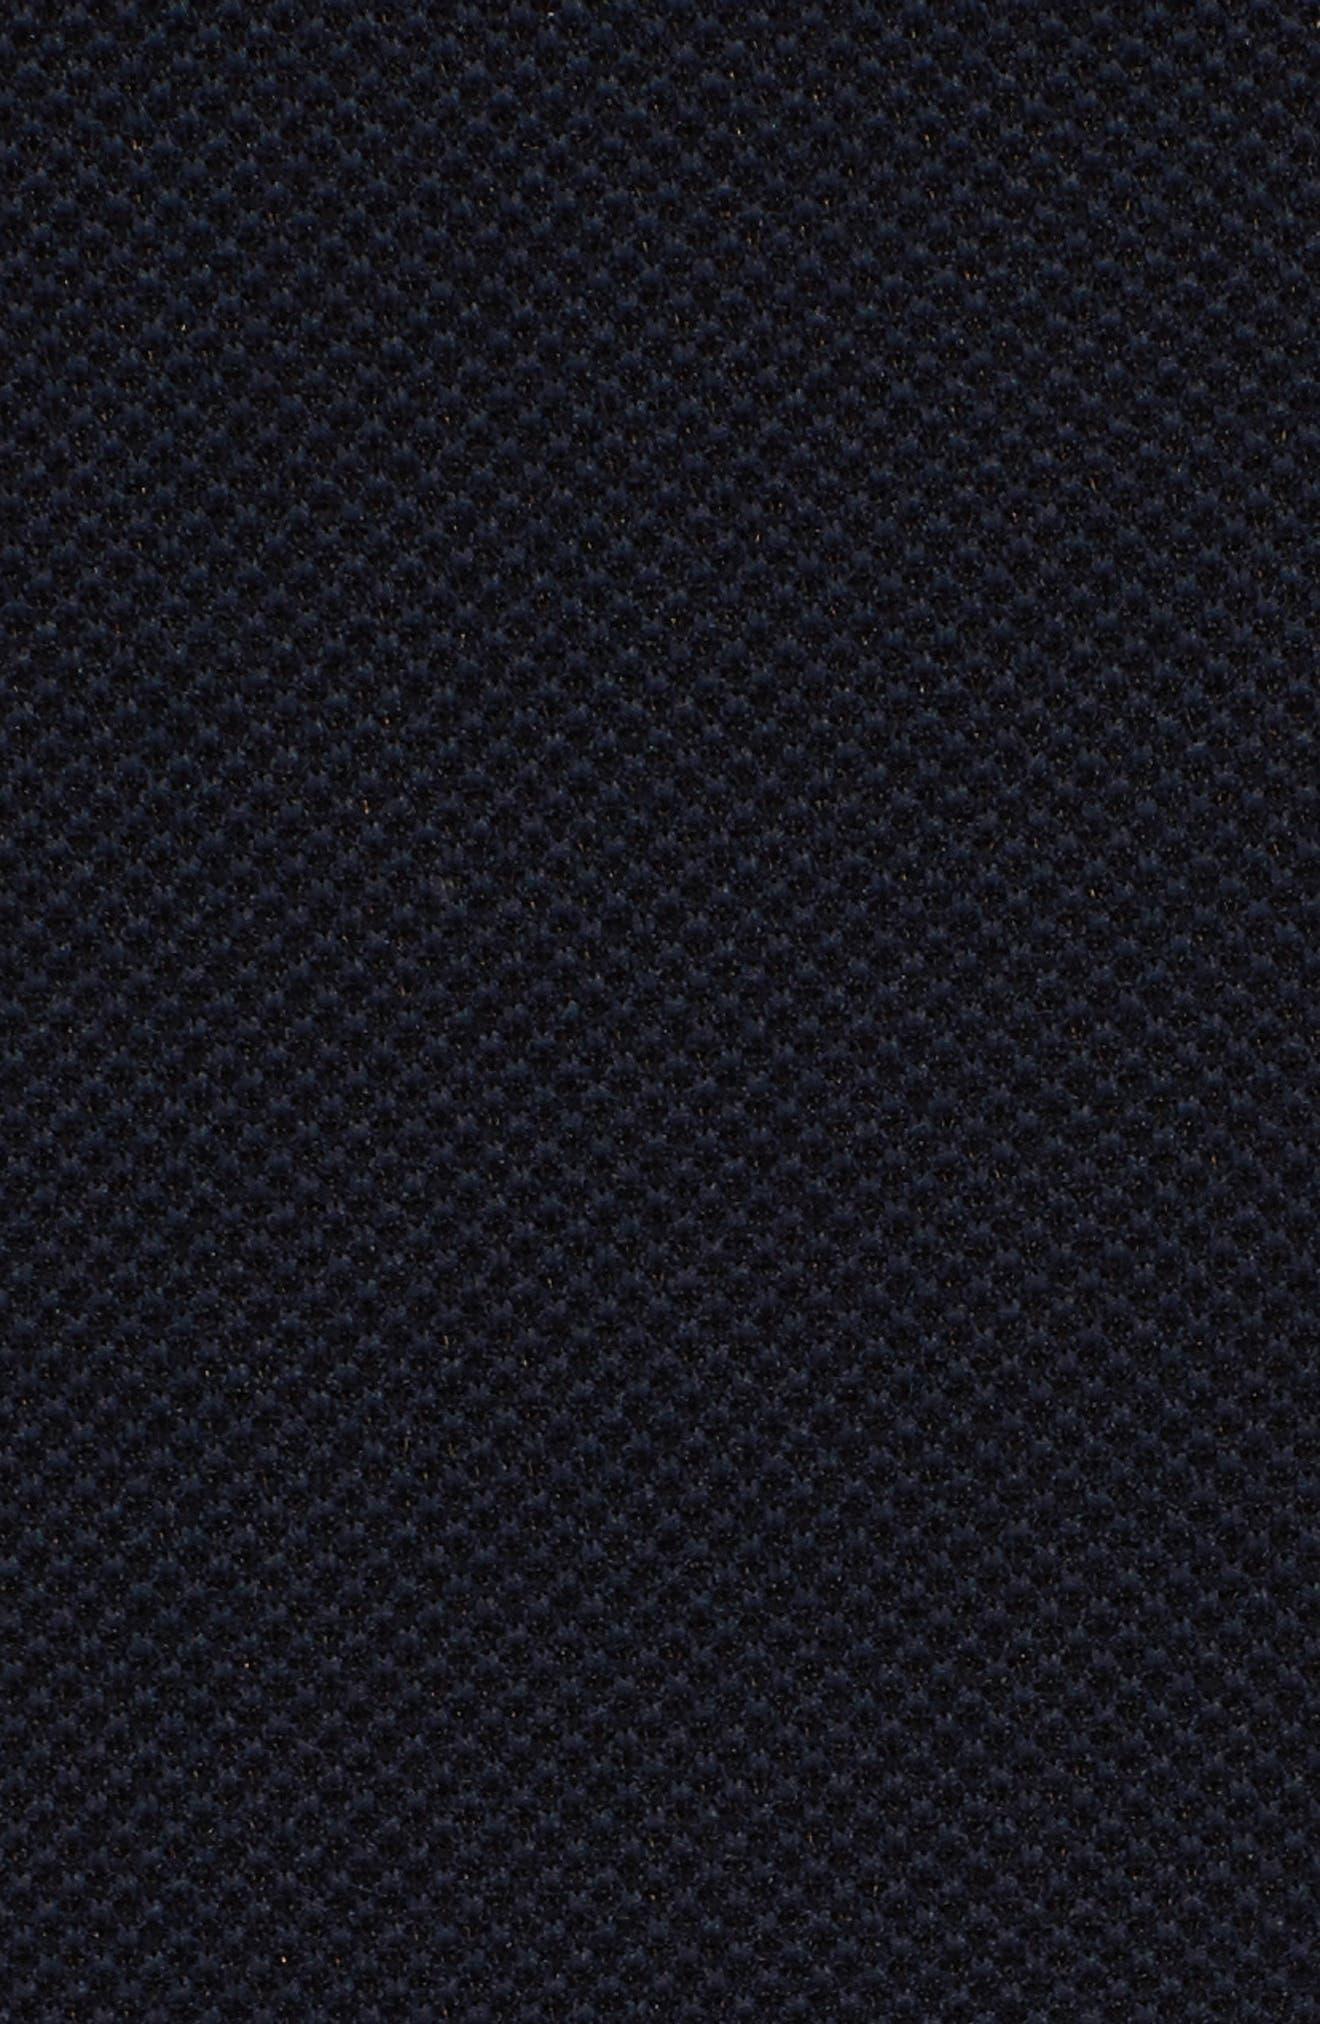 Piqué Skinny Pants,                             Alternate thumbnail 5, color,                             Black